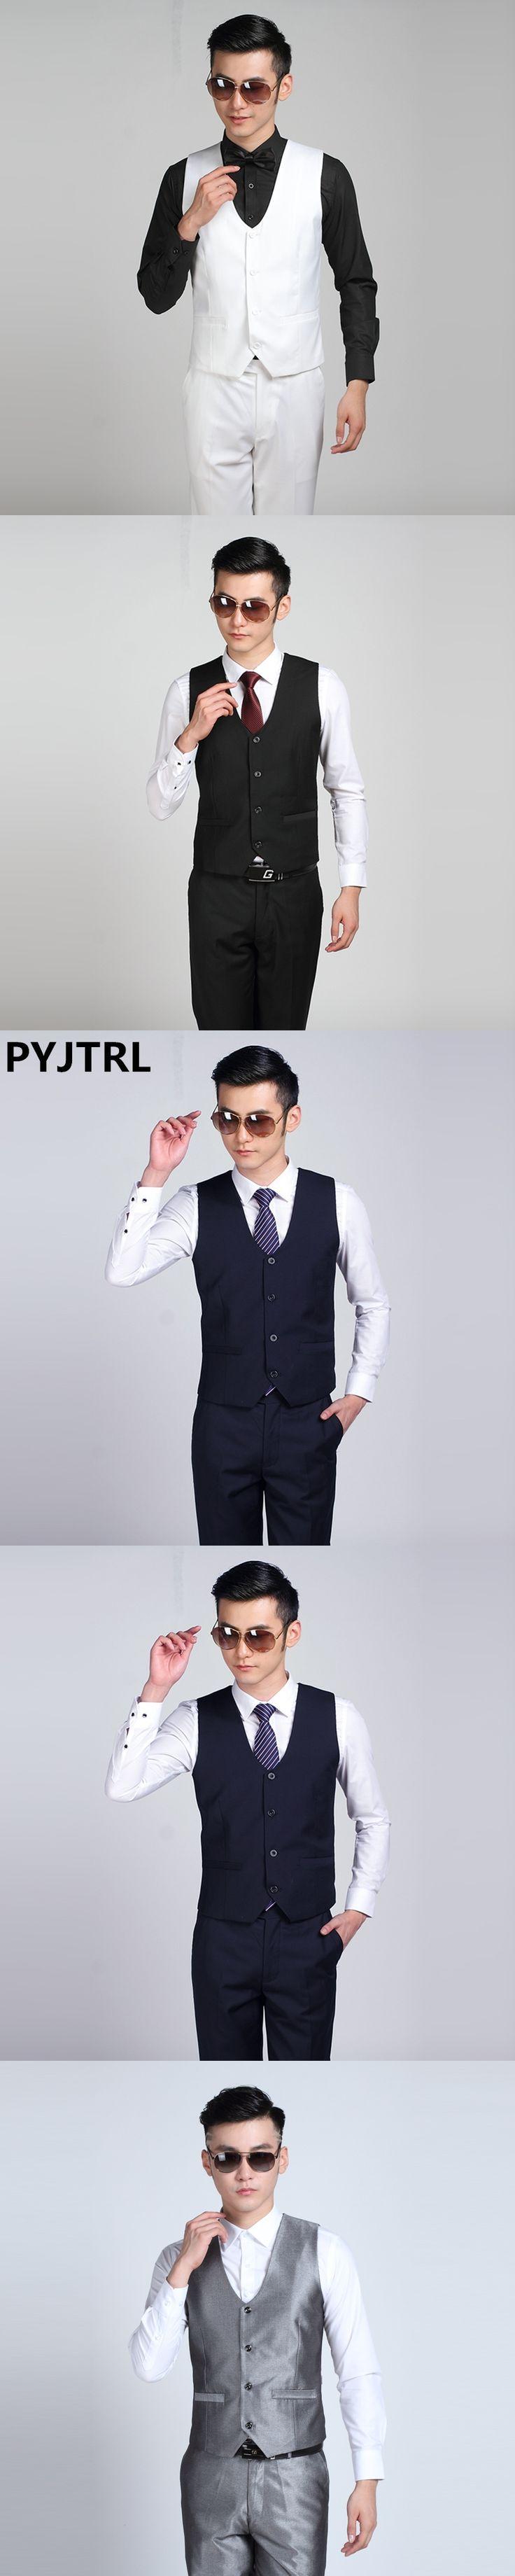 PYJTRL 2017 New Mens Fashion Suit Vest Male Korean Casual Business Shiny Black White Silver Red Navy Blue Gray Purple Waistcoat